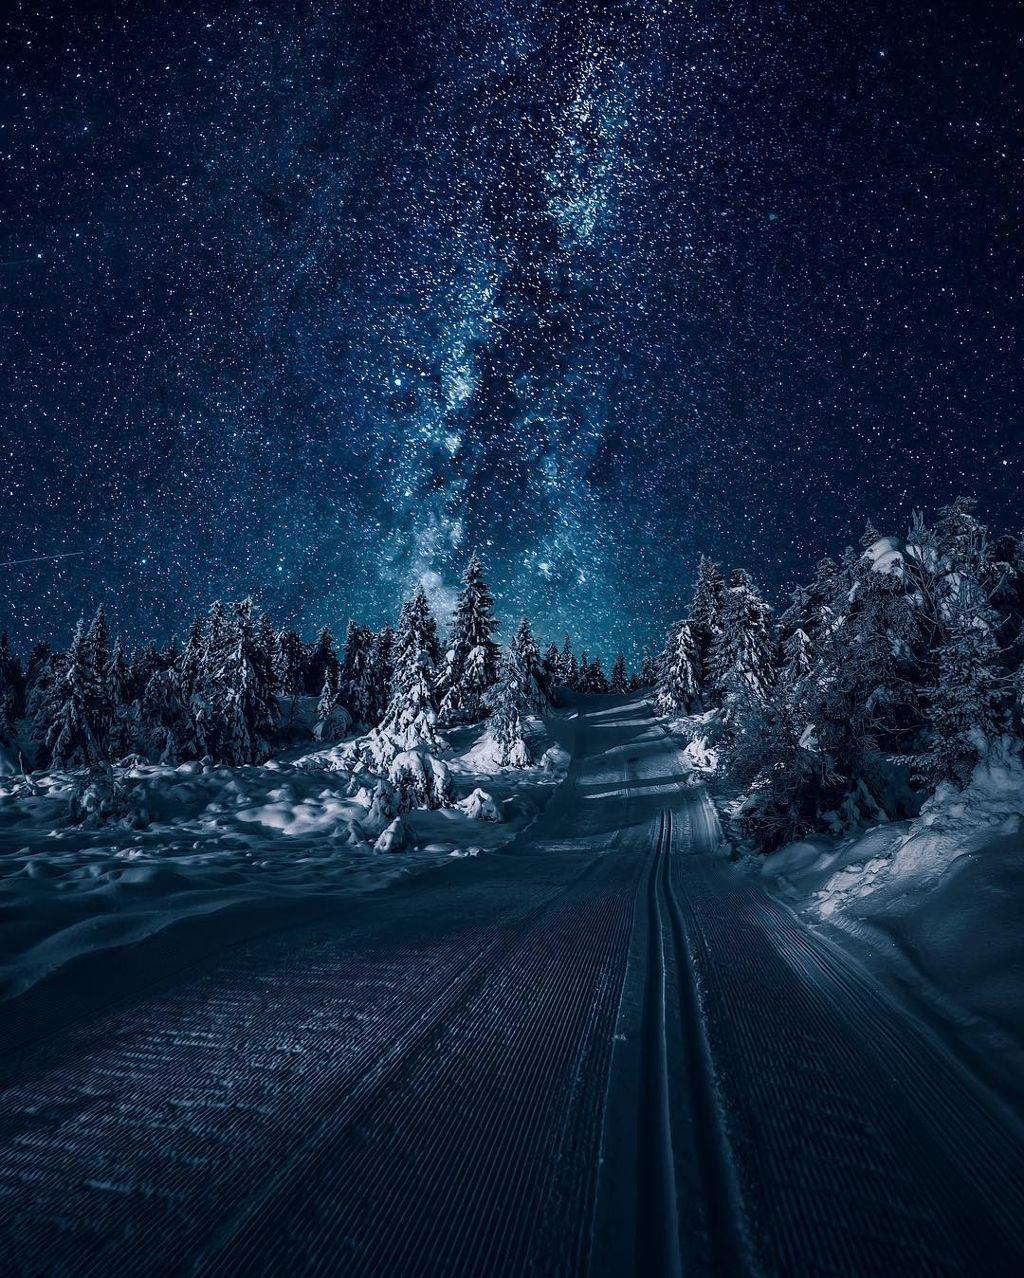 😍🥰😱🔷️🌎💦❄🌟⭐🌠📸 #blue #infinity #star #sky #road #curious #beautifulscenery #freetoedit #remixit #followme 🥰